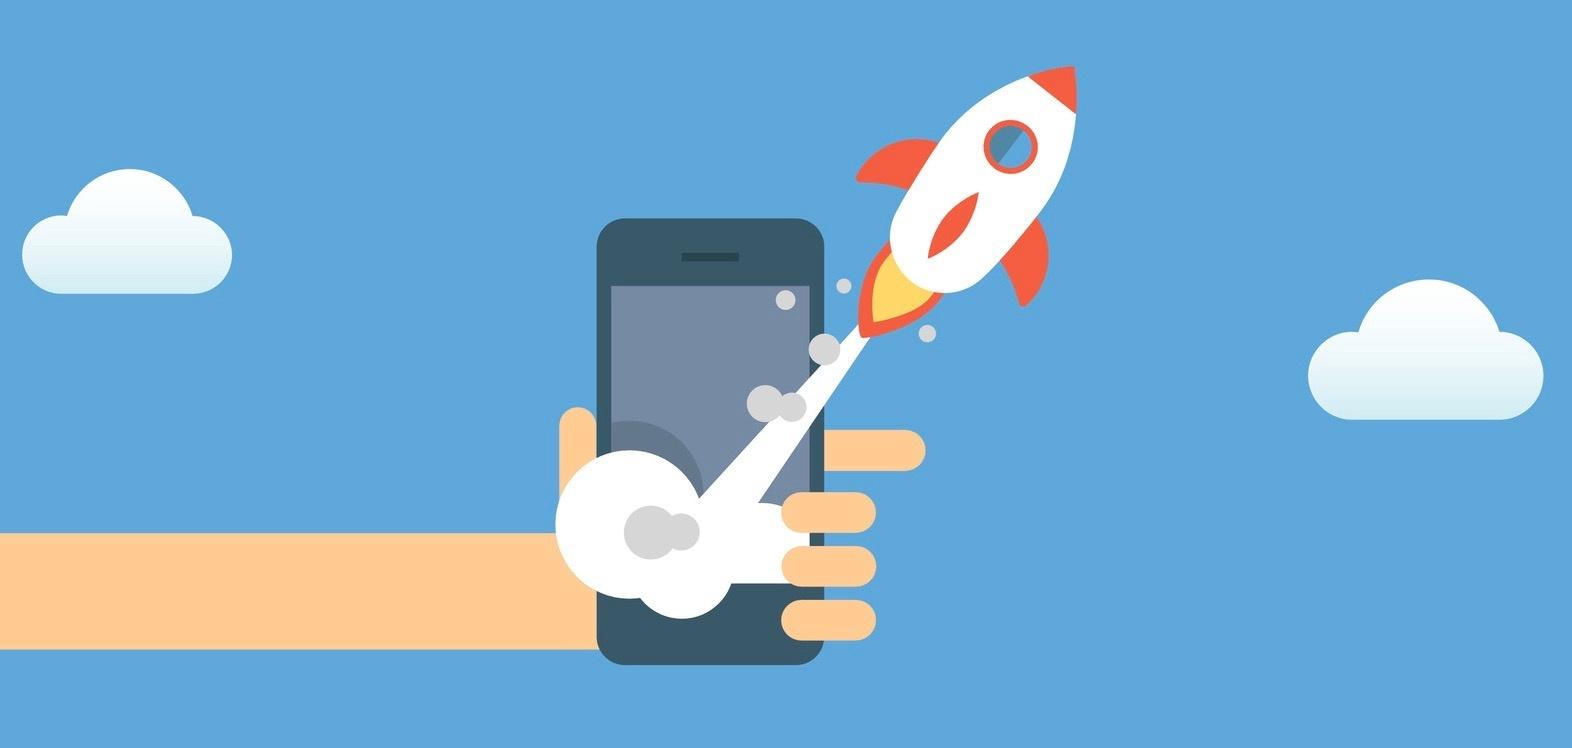 smartphone-app-rakete-startet